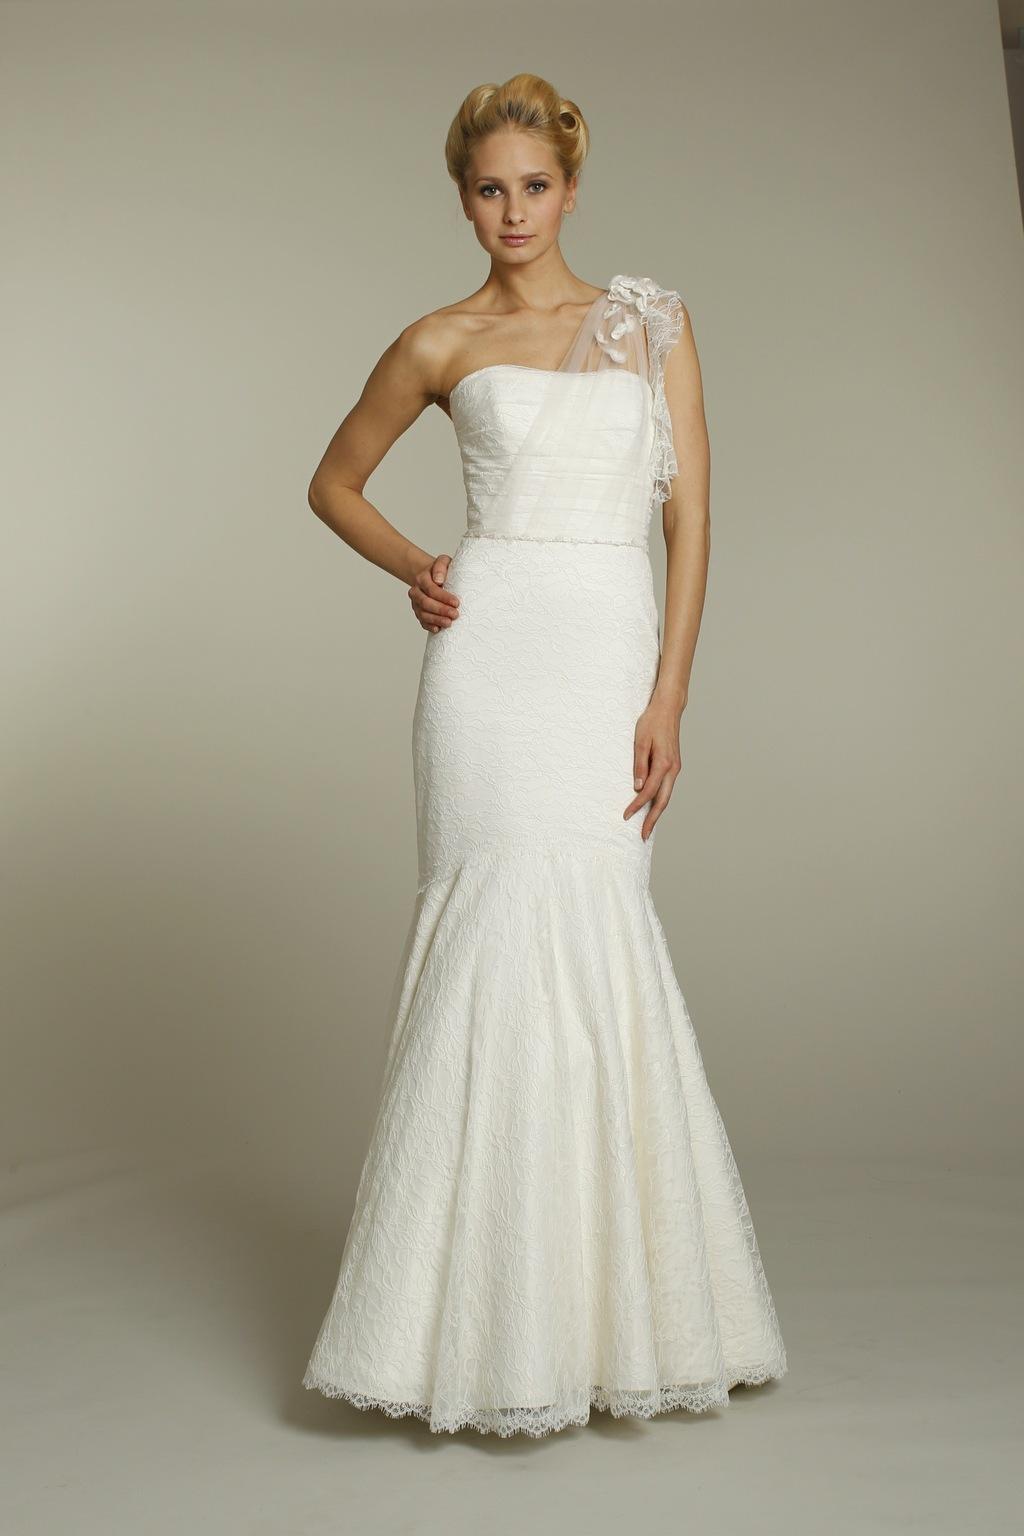 9158-alvina-valenta-wedding-dress-2011-bridal-gowns-ivory-strapless-one-shoulder-mermaid.full